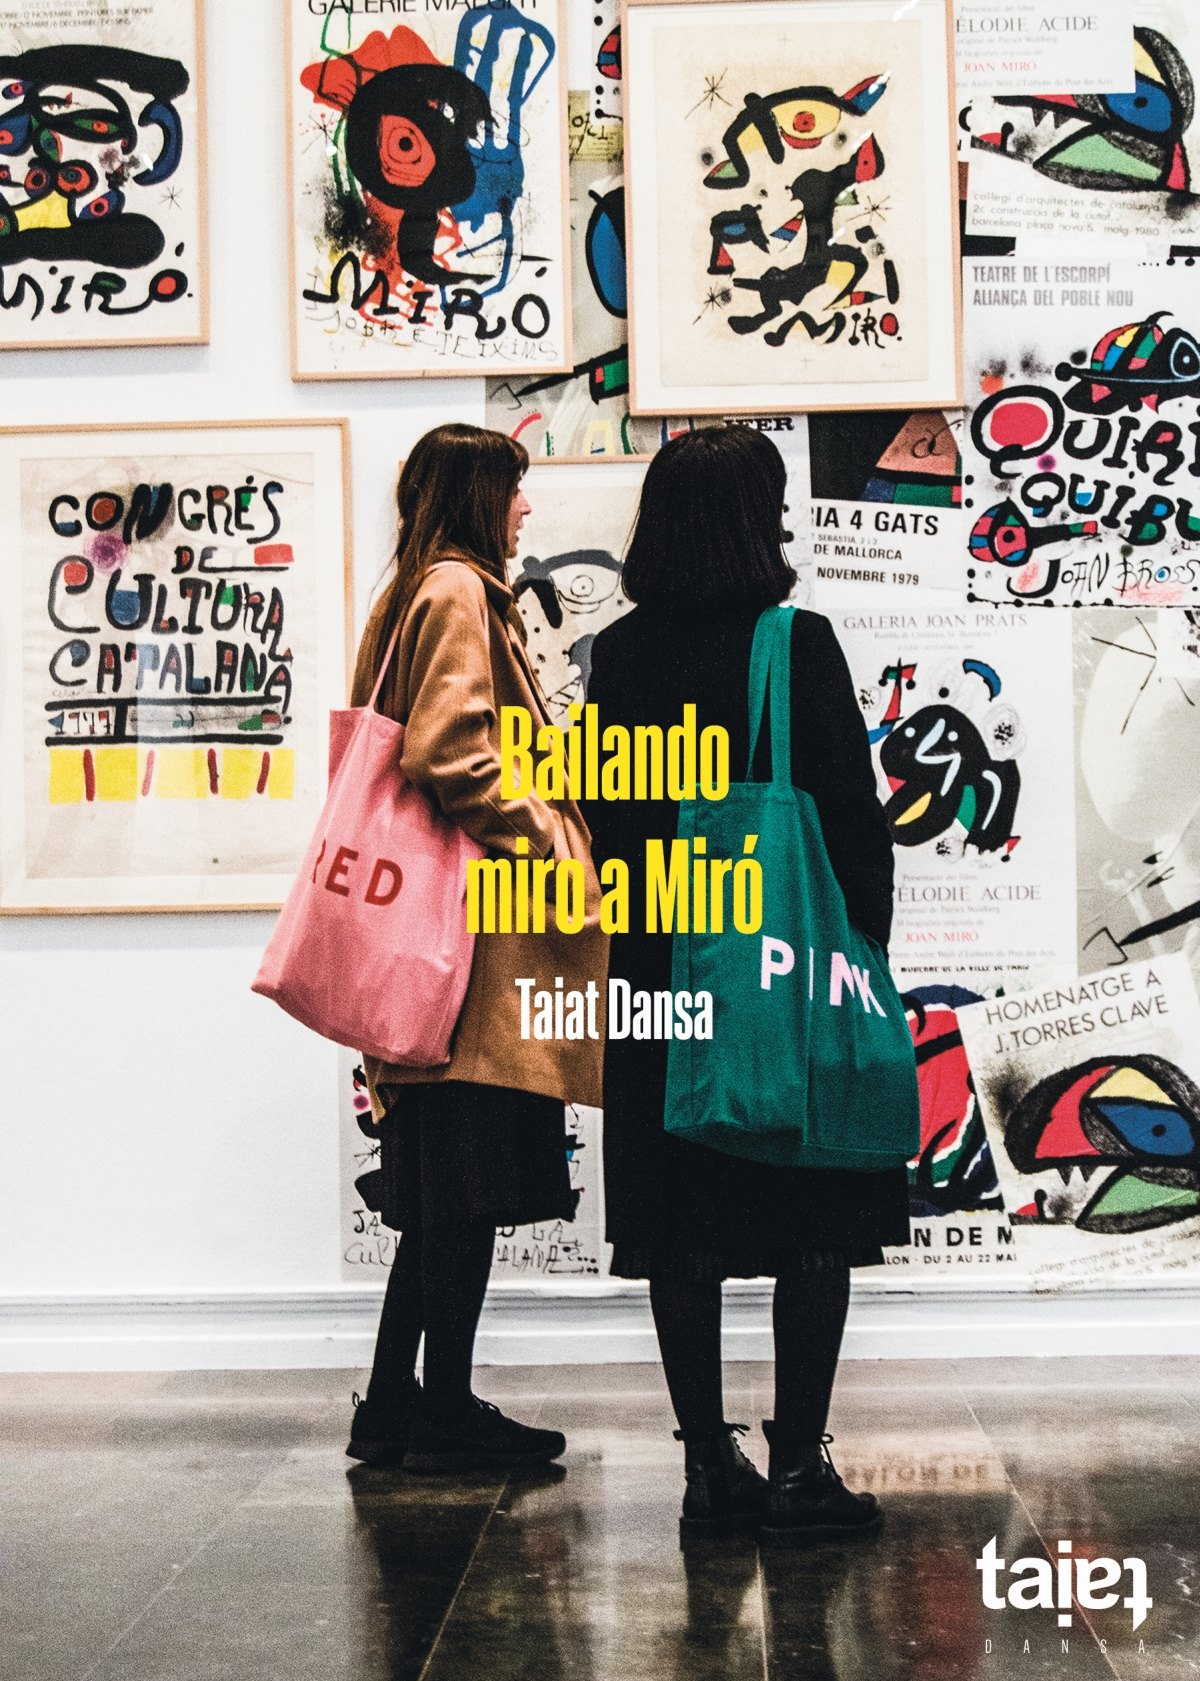 Taiat Miró cartel.lecoolvalencia